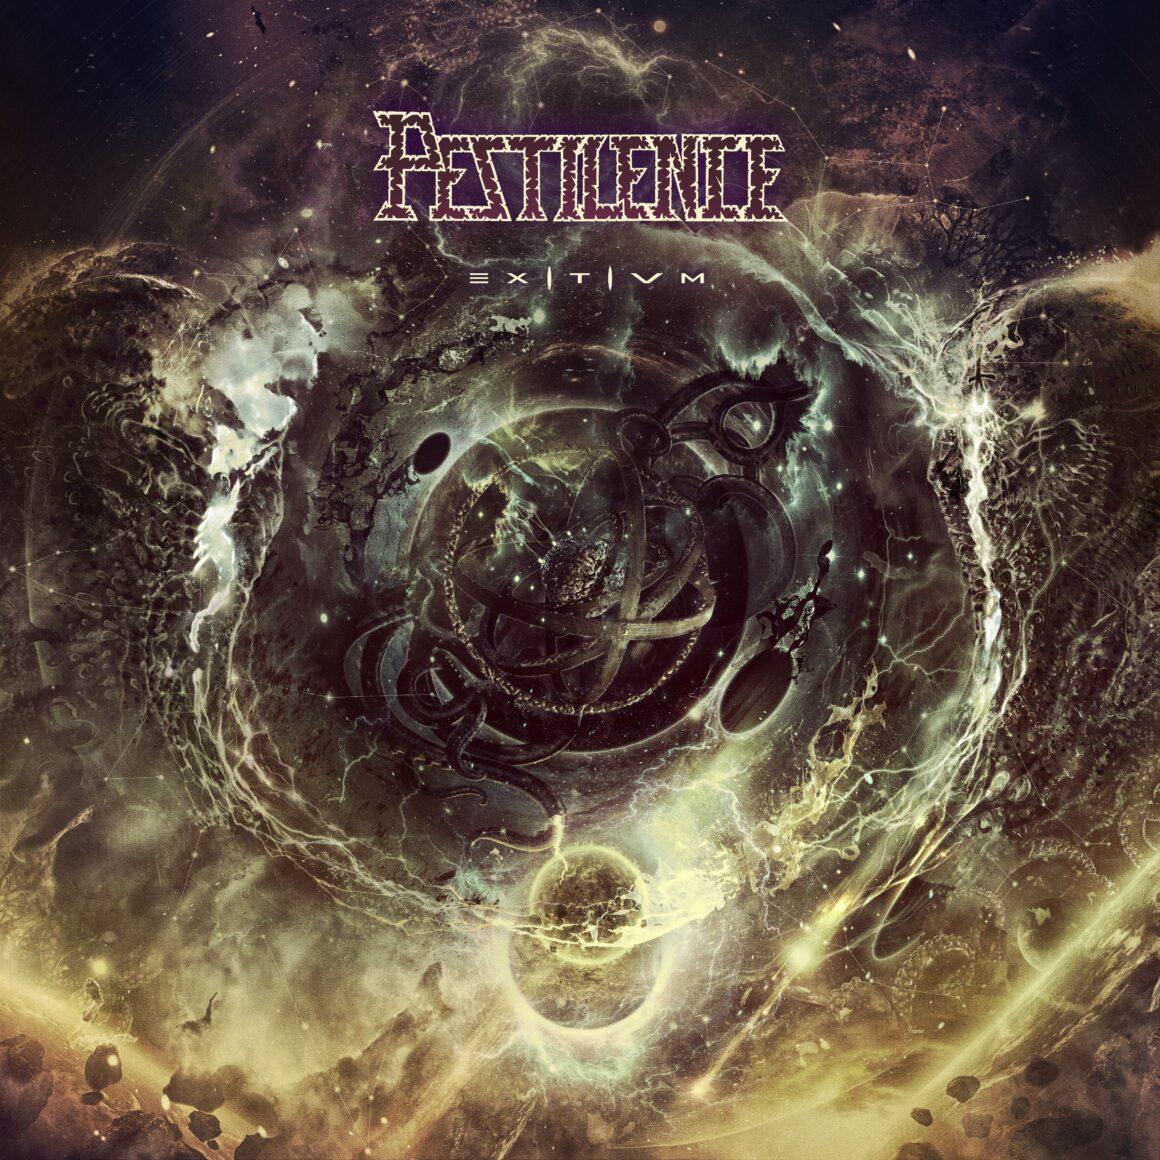 PESTILENCE album cover by Michał 'Xaay' Loranc